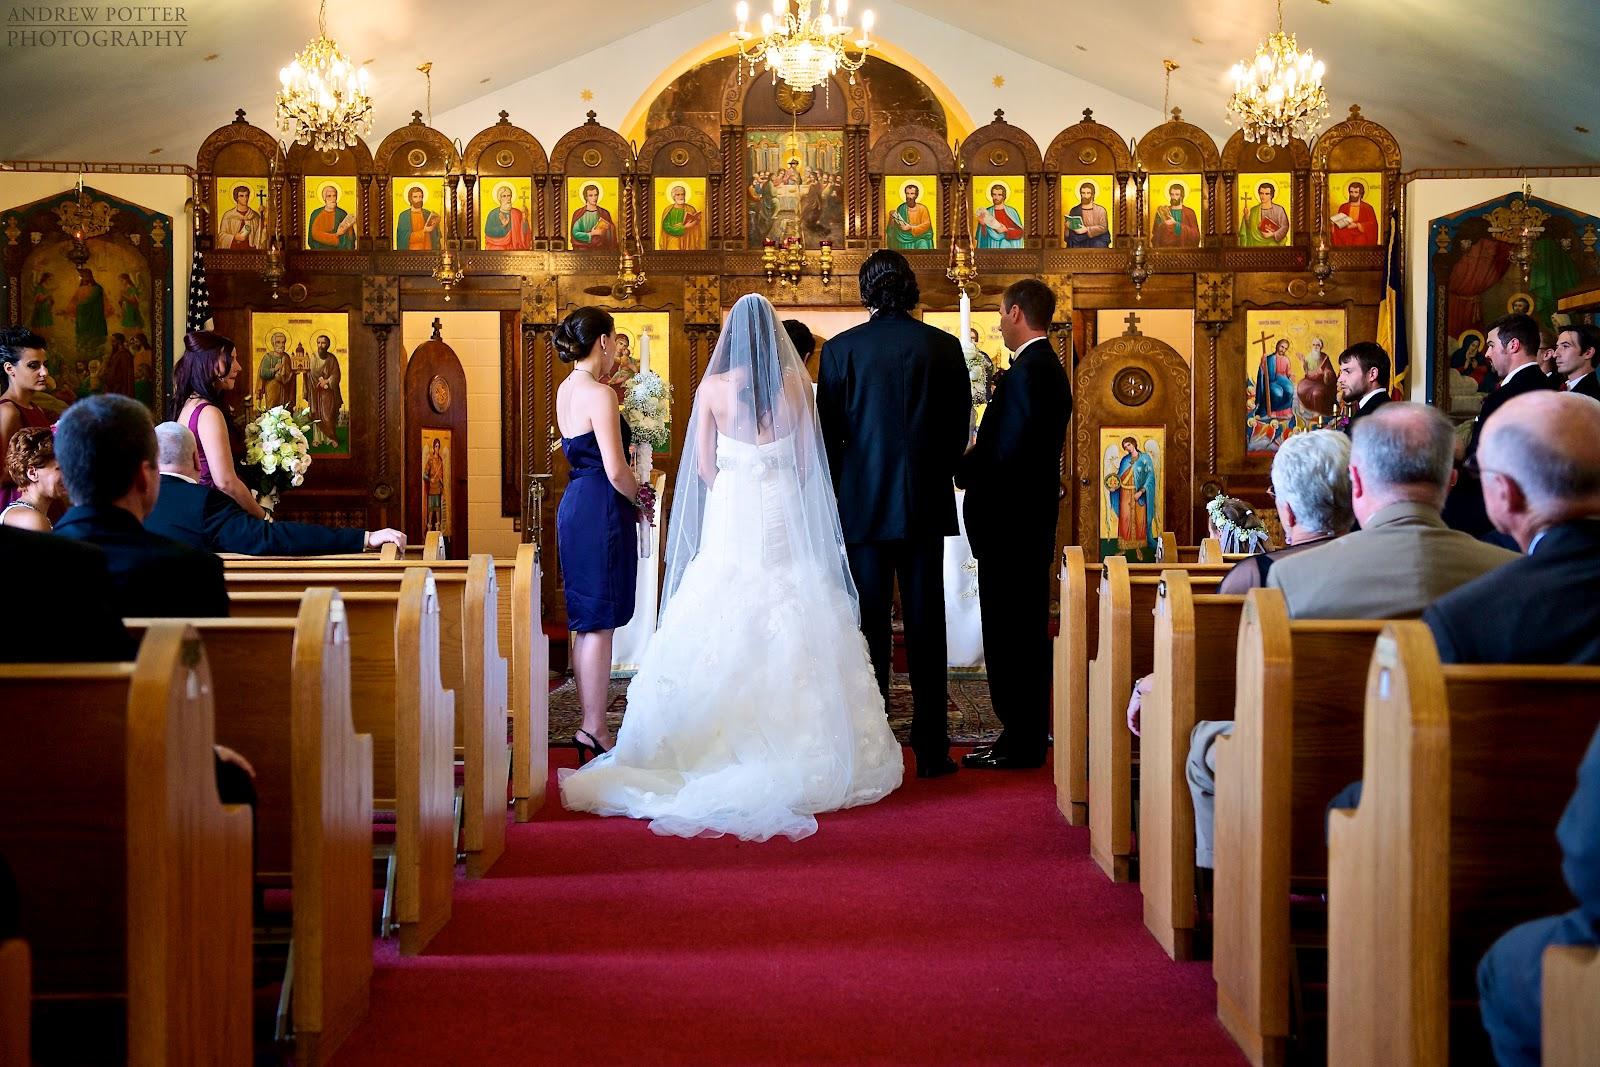 Wedding Ceremonies: Andrew Potter Photo Blog: Romanian Wedding Ceremony